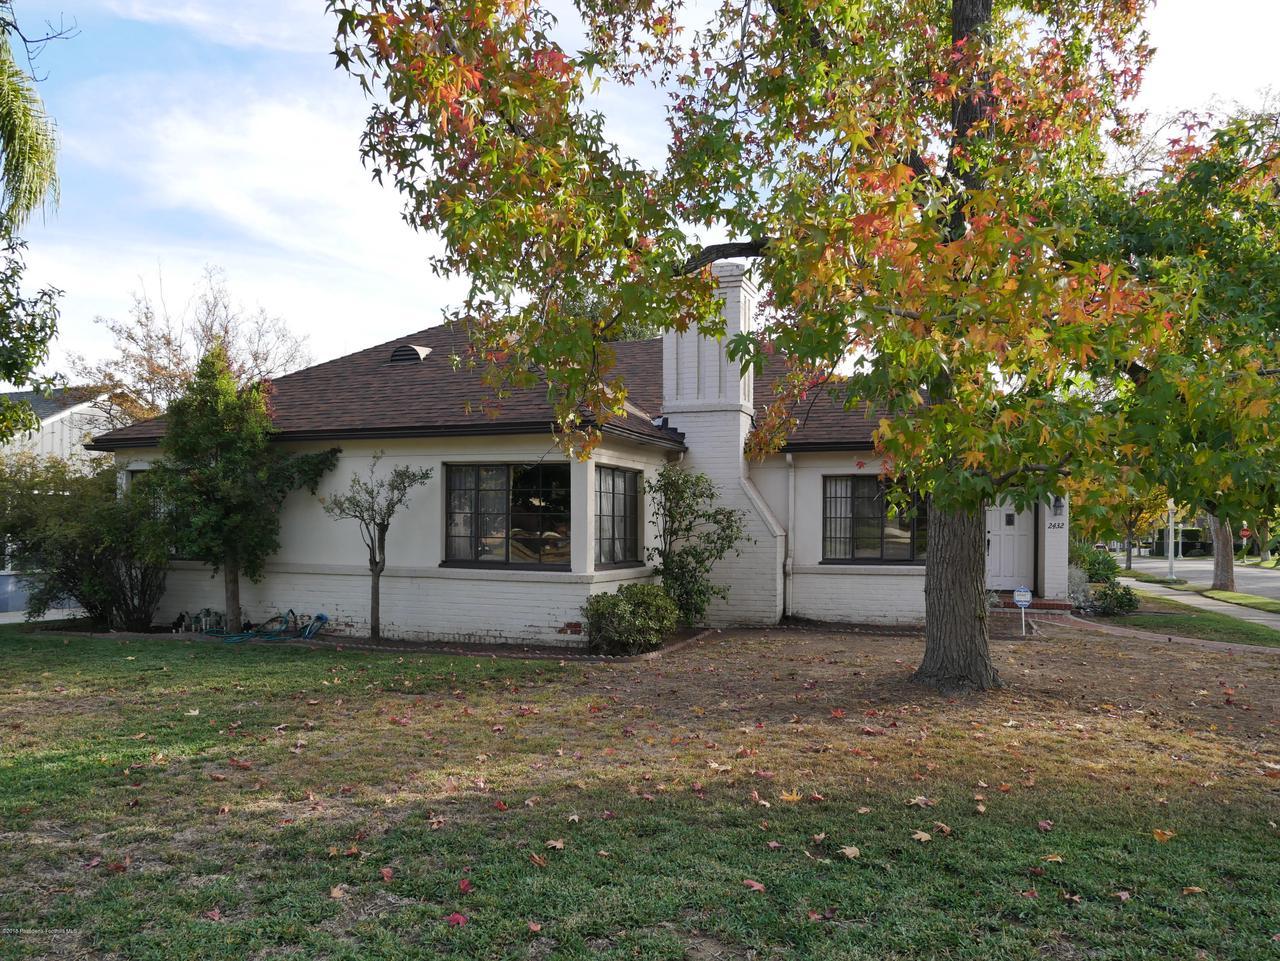 2432 ORANGE GROVE, Pasadena, CA 91104 - Front yard 1